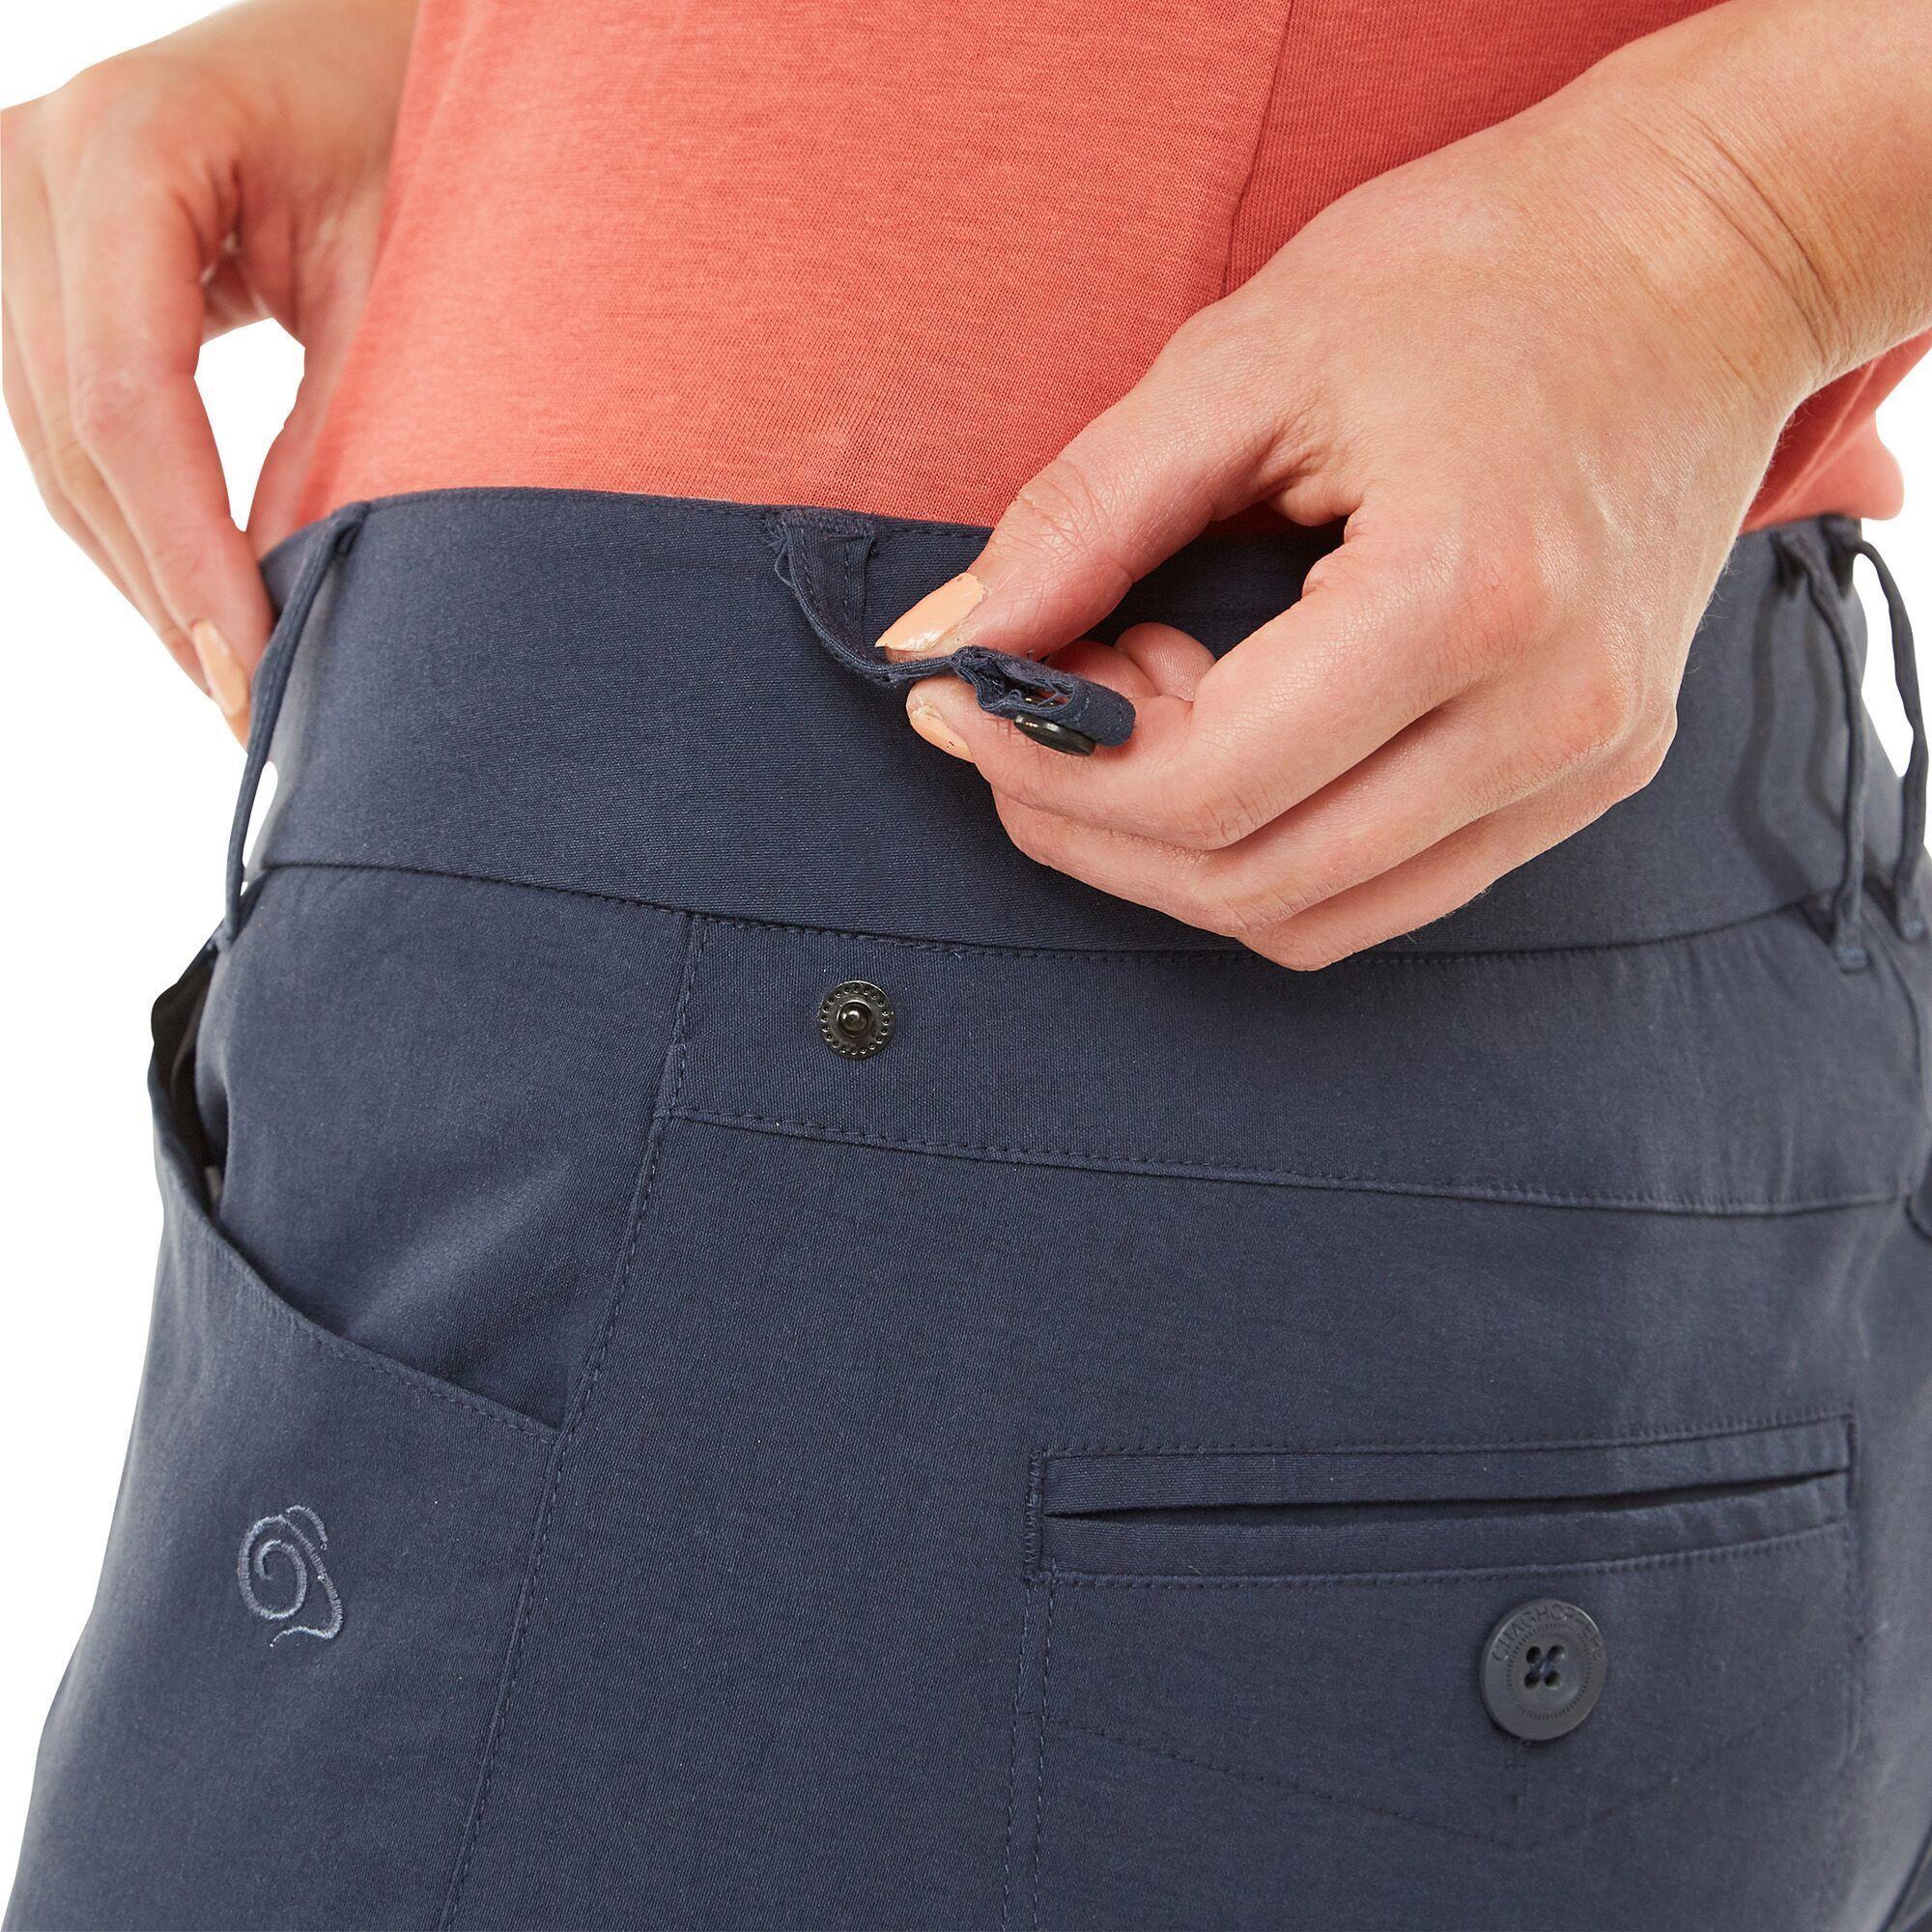 Craghoppers-Pantalon-CLARA-Femme-CG1066 miniature 13